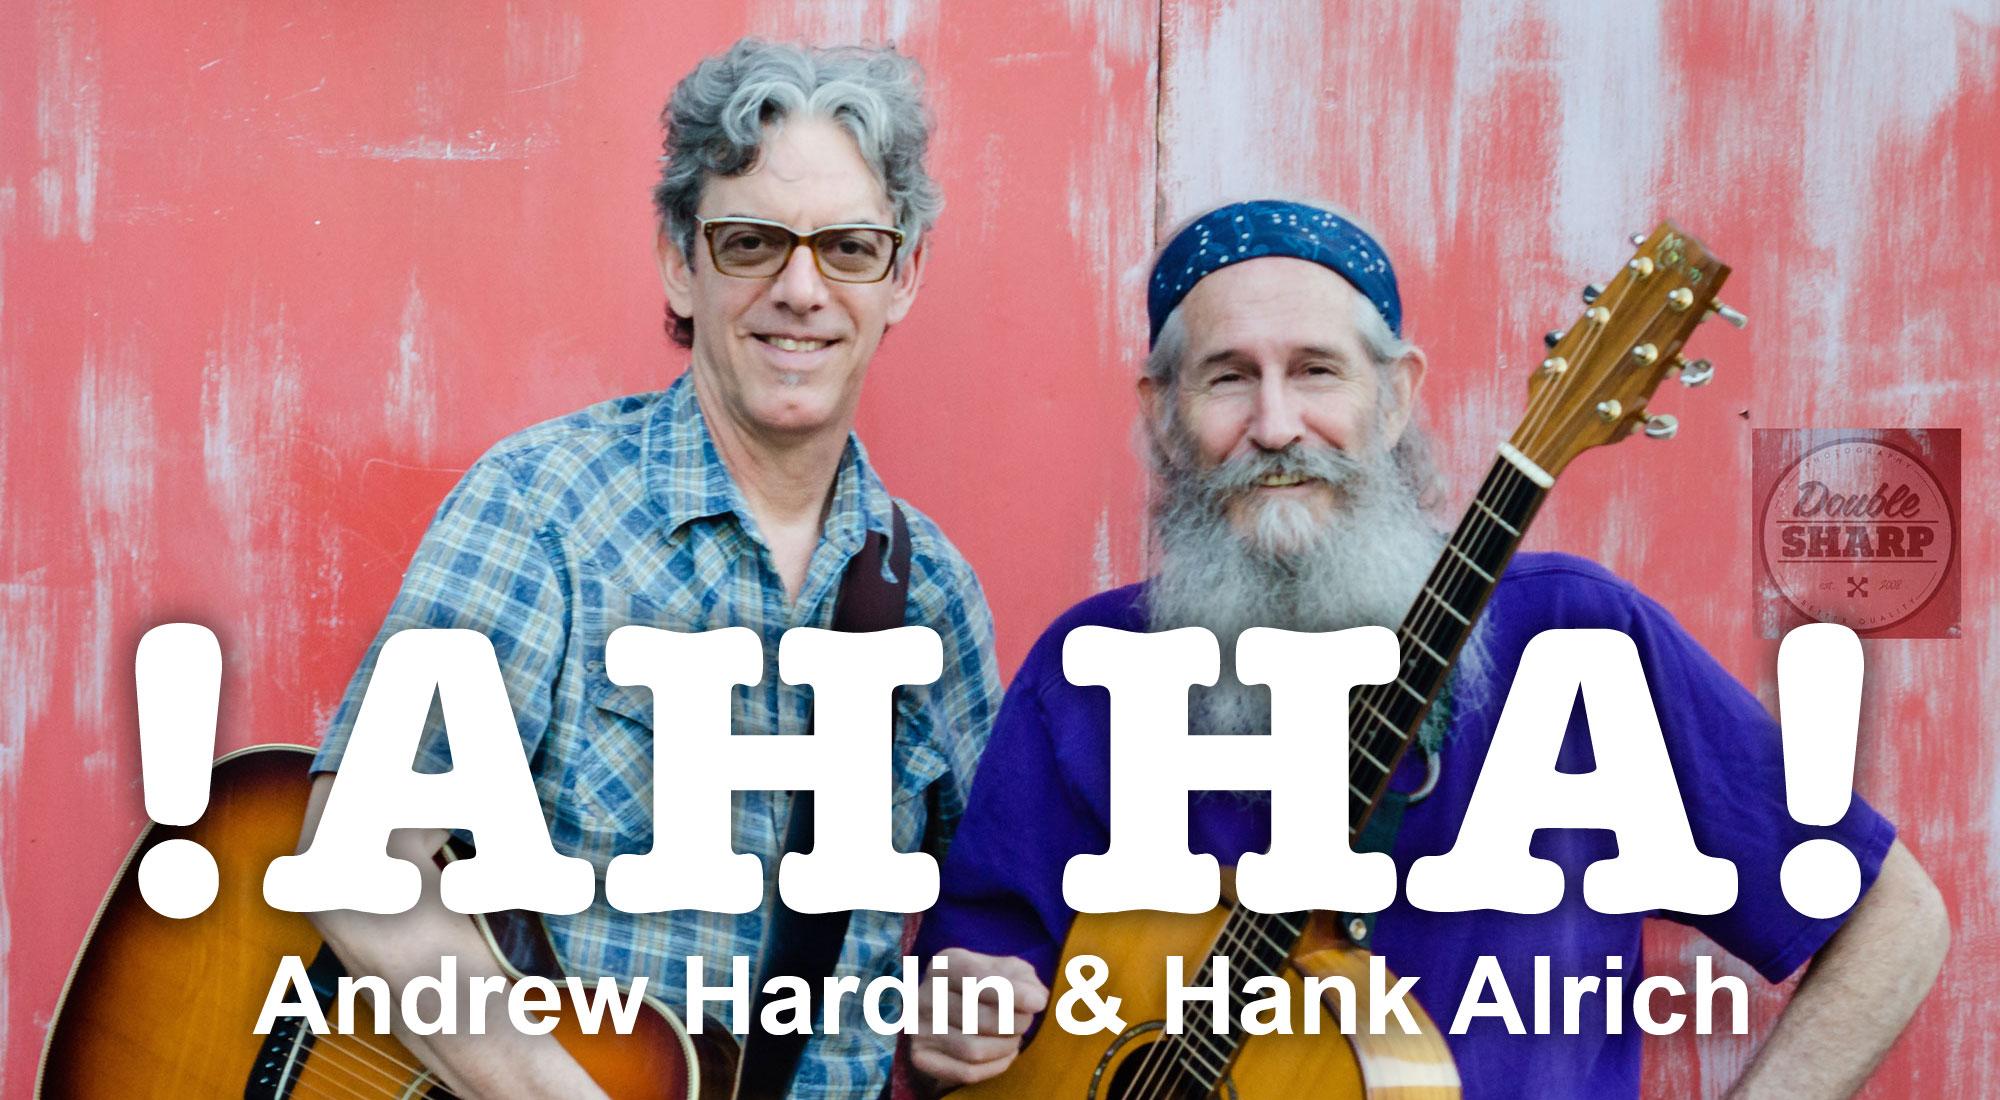 !AH HA! Andrew Hardin & Hank Alrich